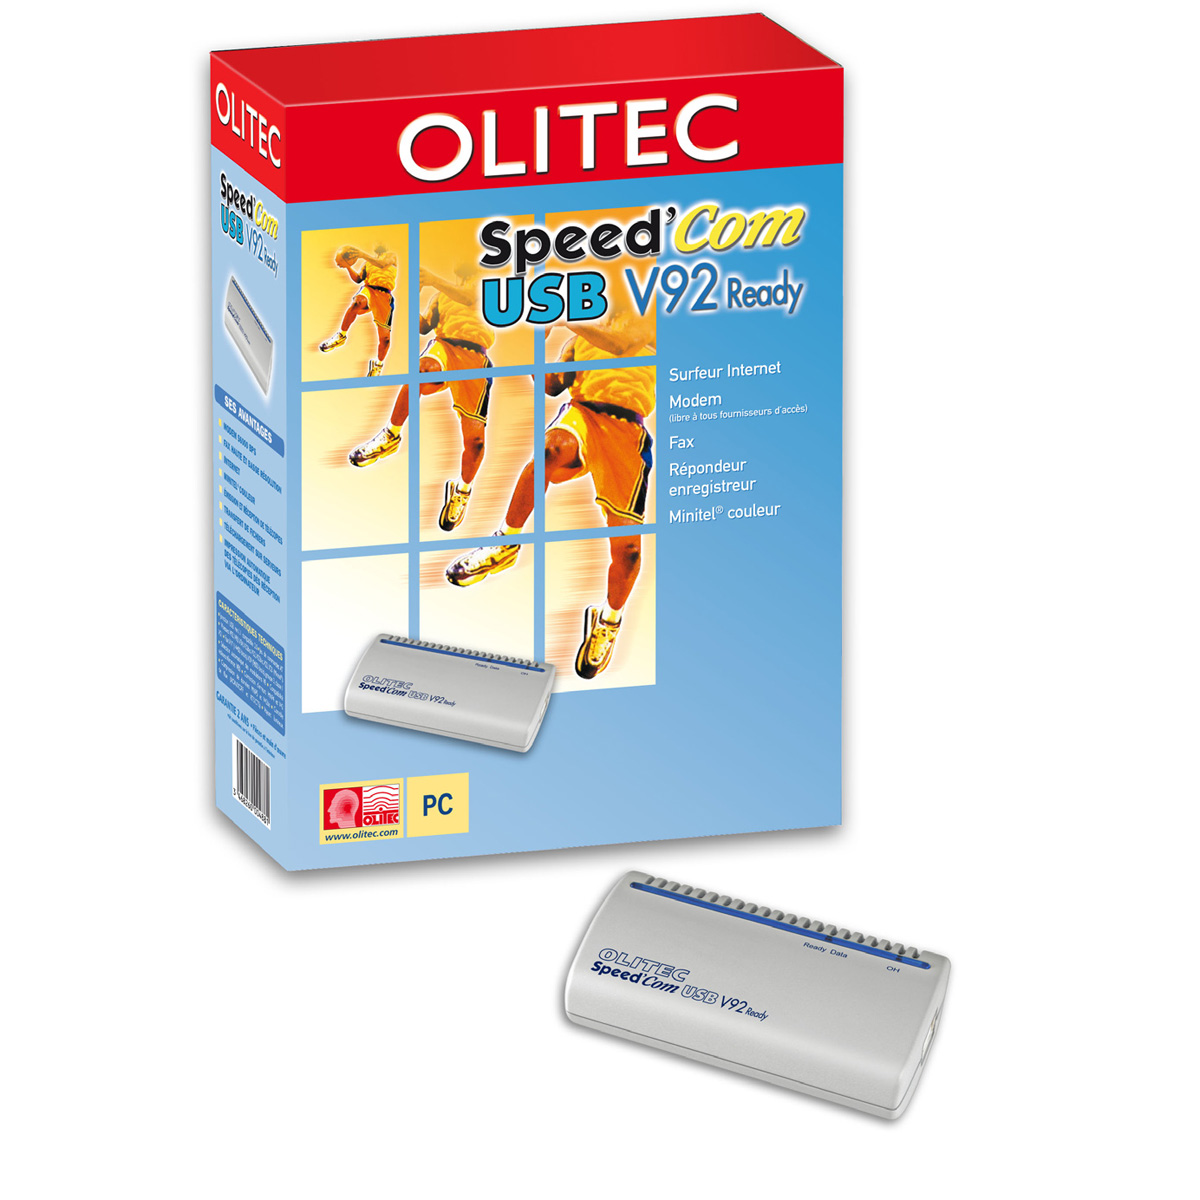 Modem & routeur Olitec Speed'Com USB V92 Ready V4 Olitec Speed'Com USB V92 Ready V4